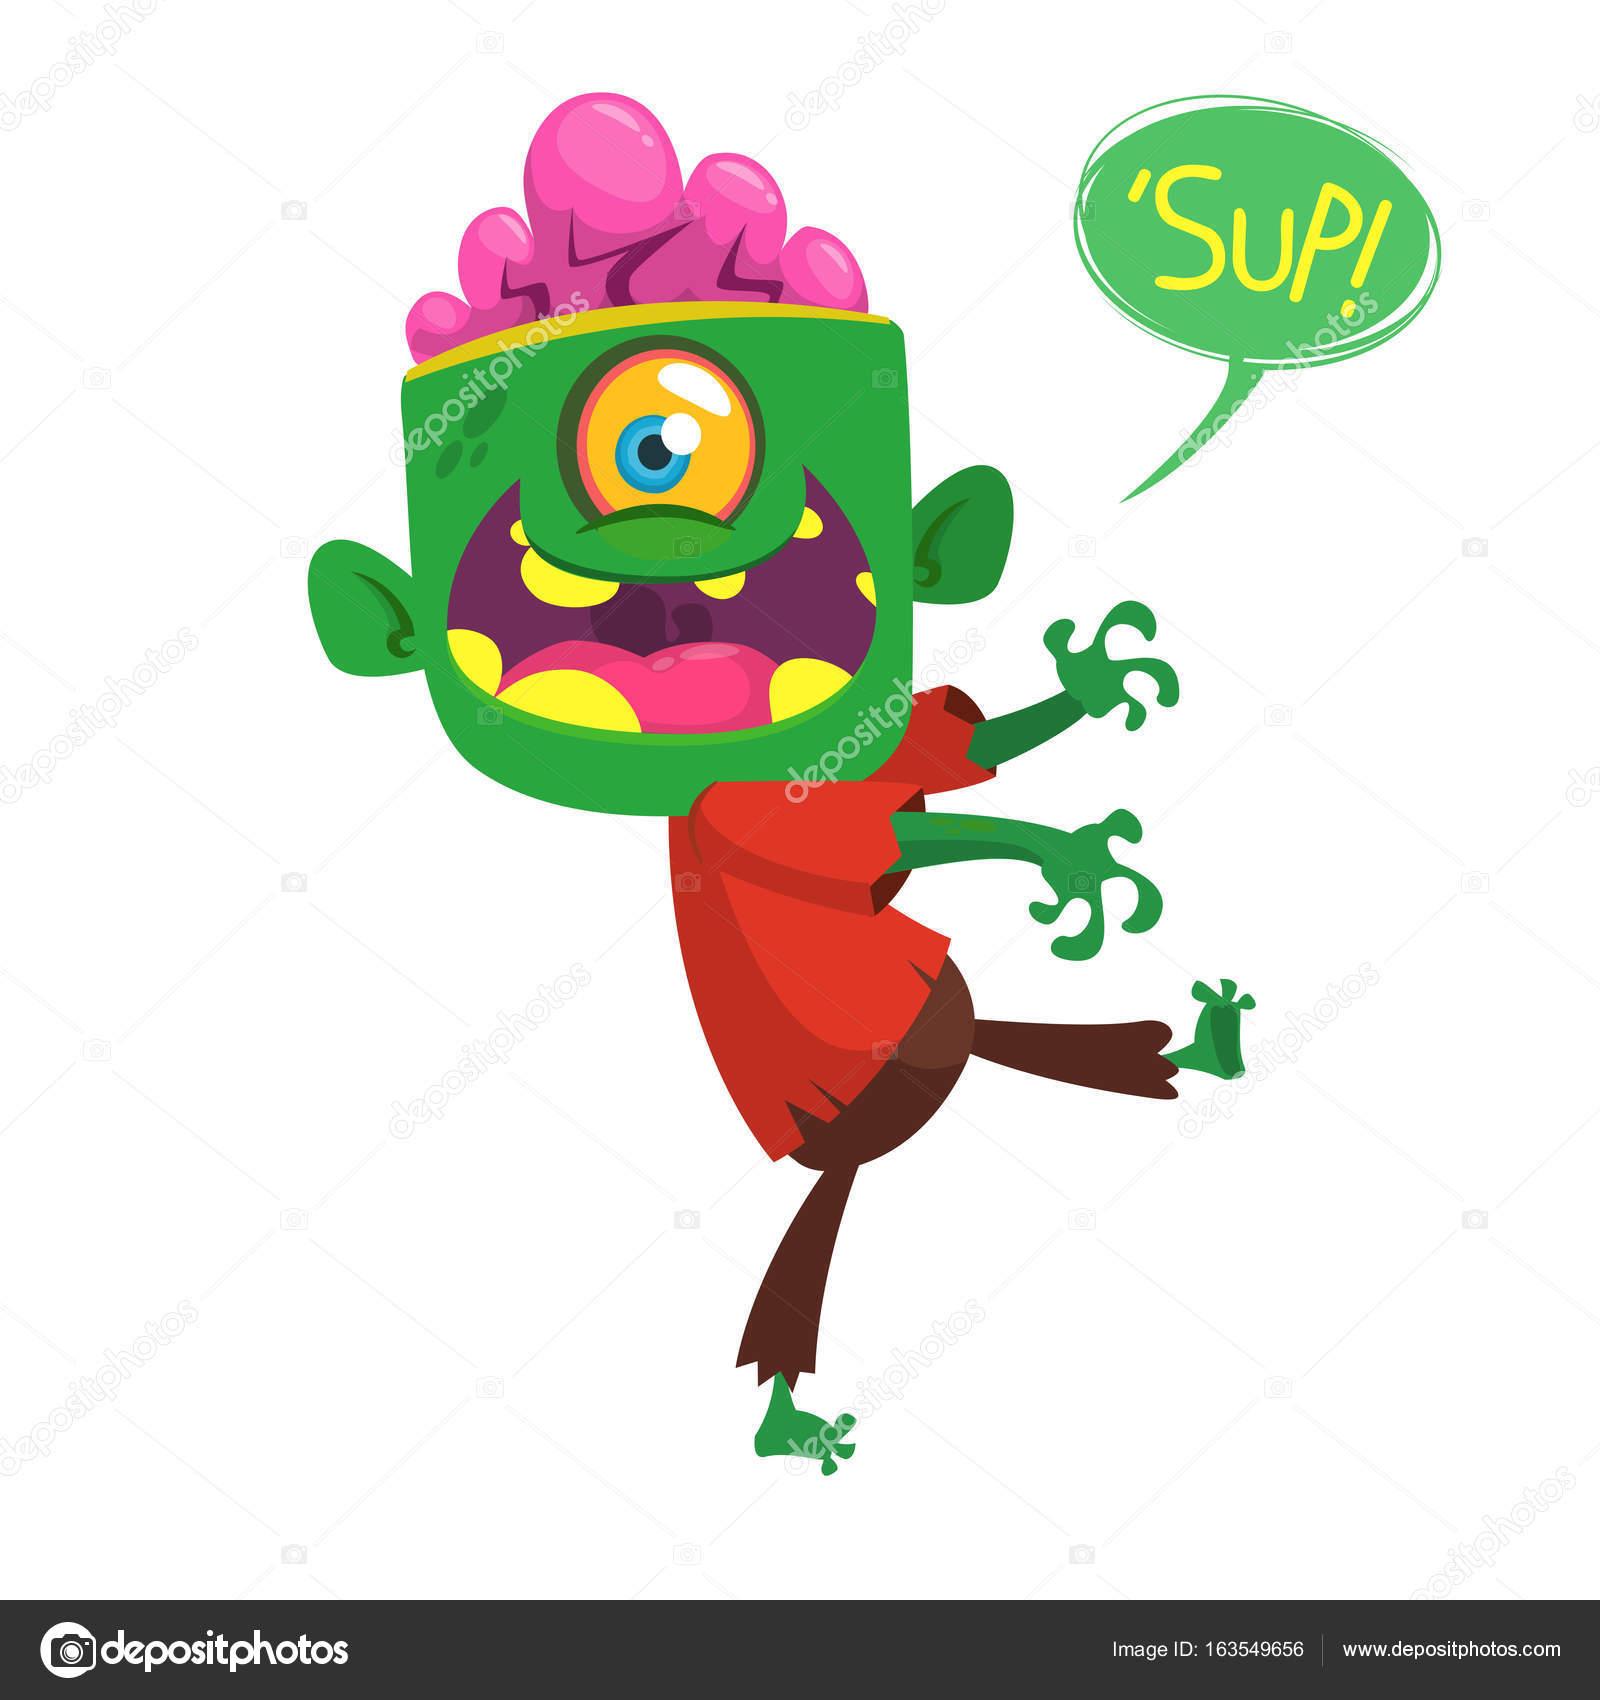 1 Eyed Cartoon Characters : Red cartoon character with one eye ankaperla